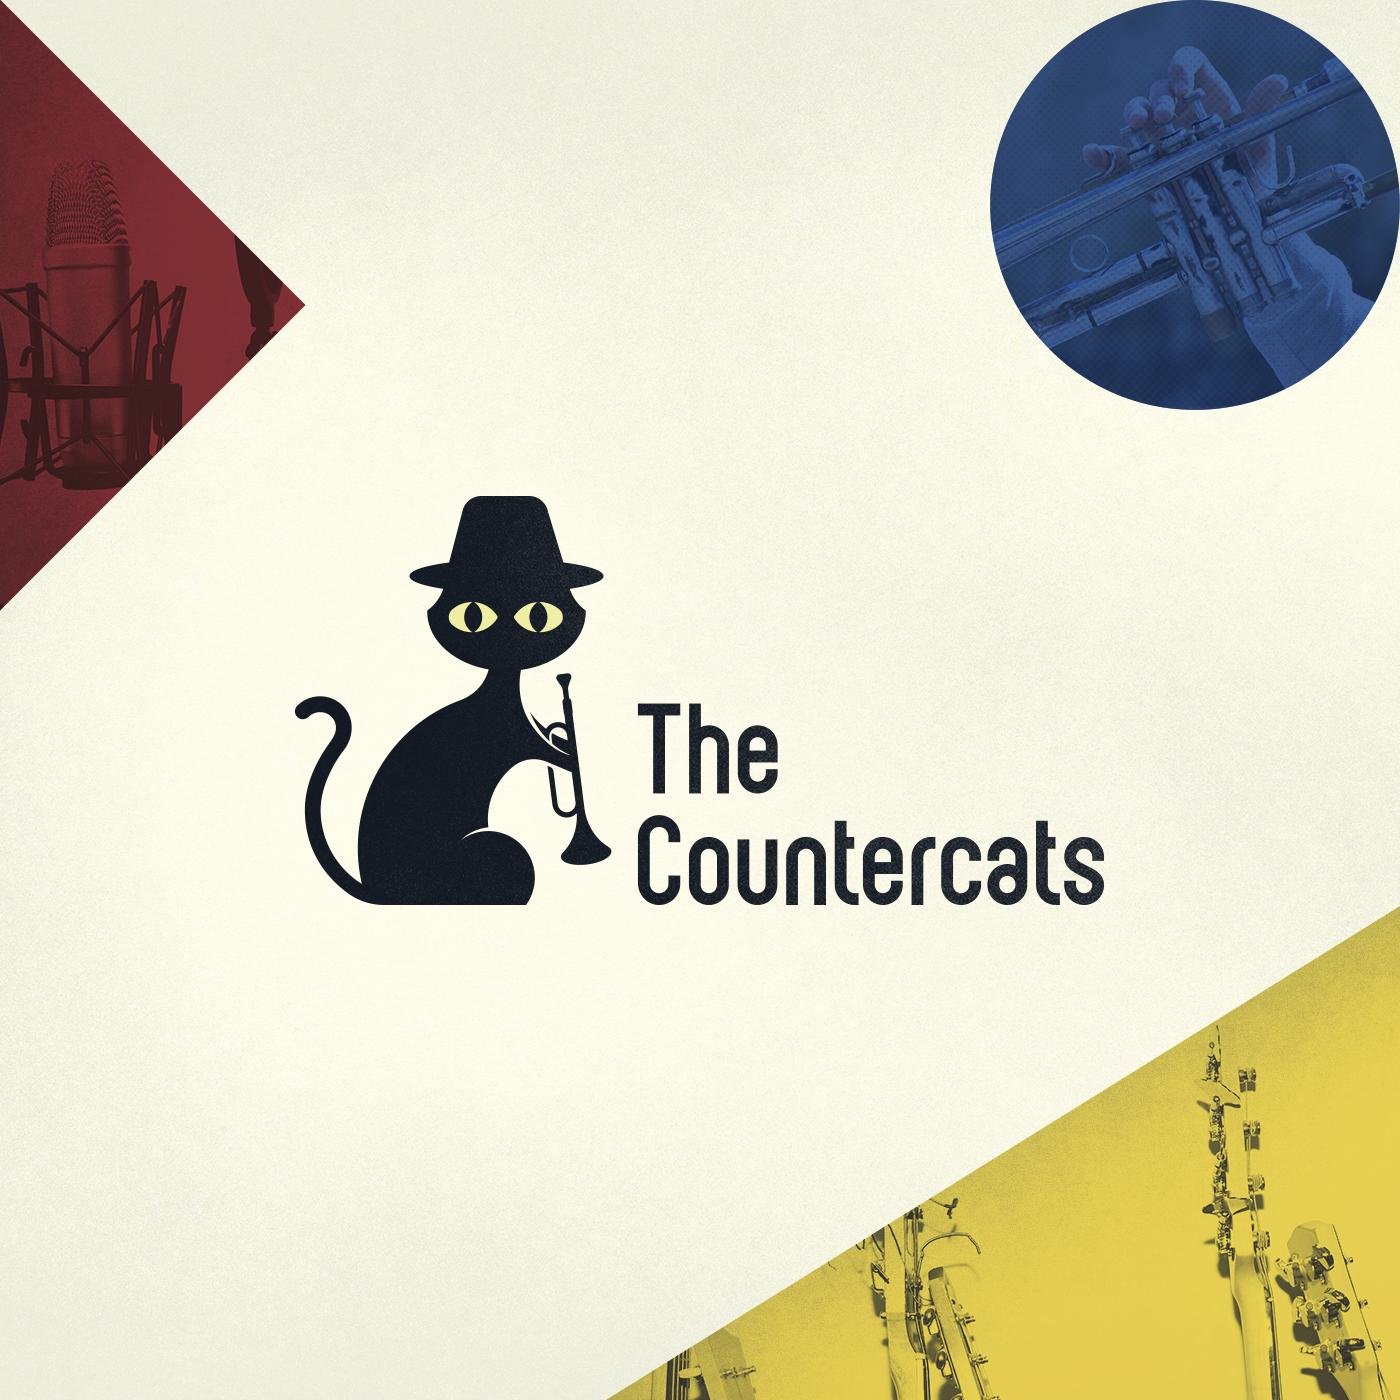 Jazz cat logo